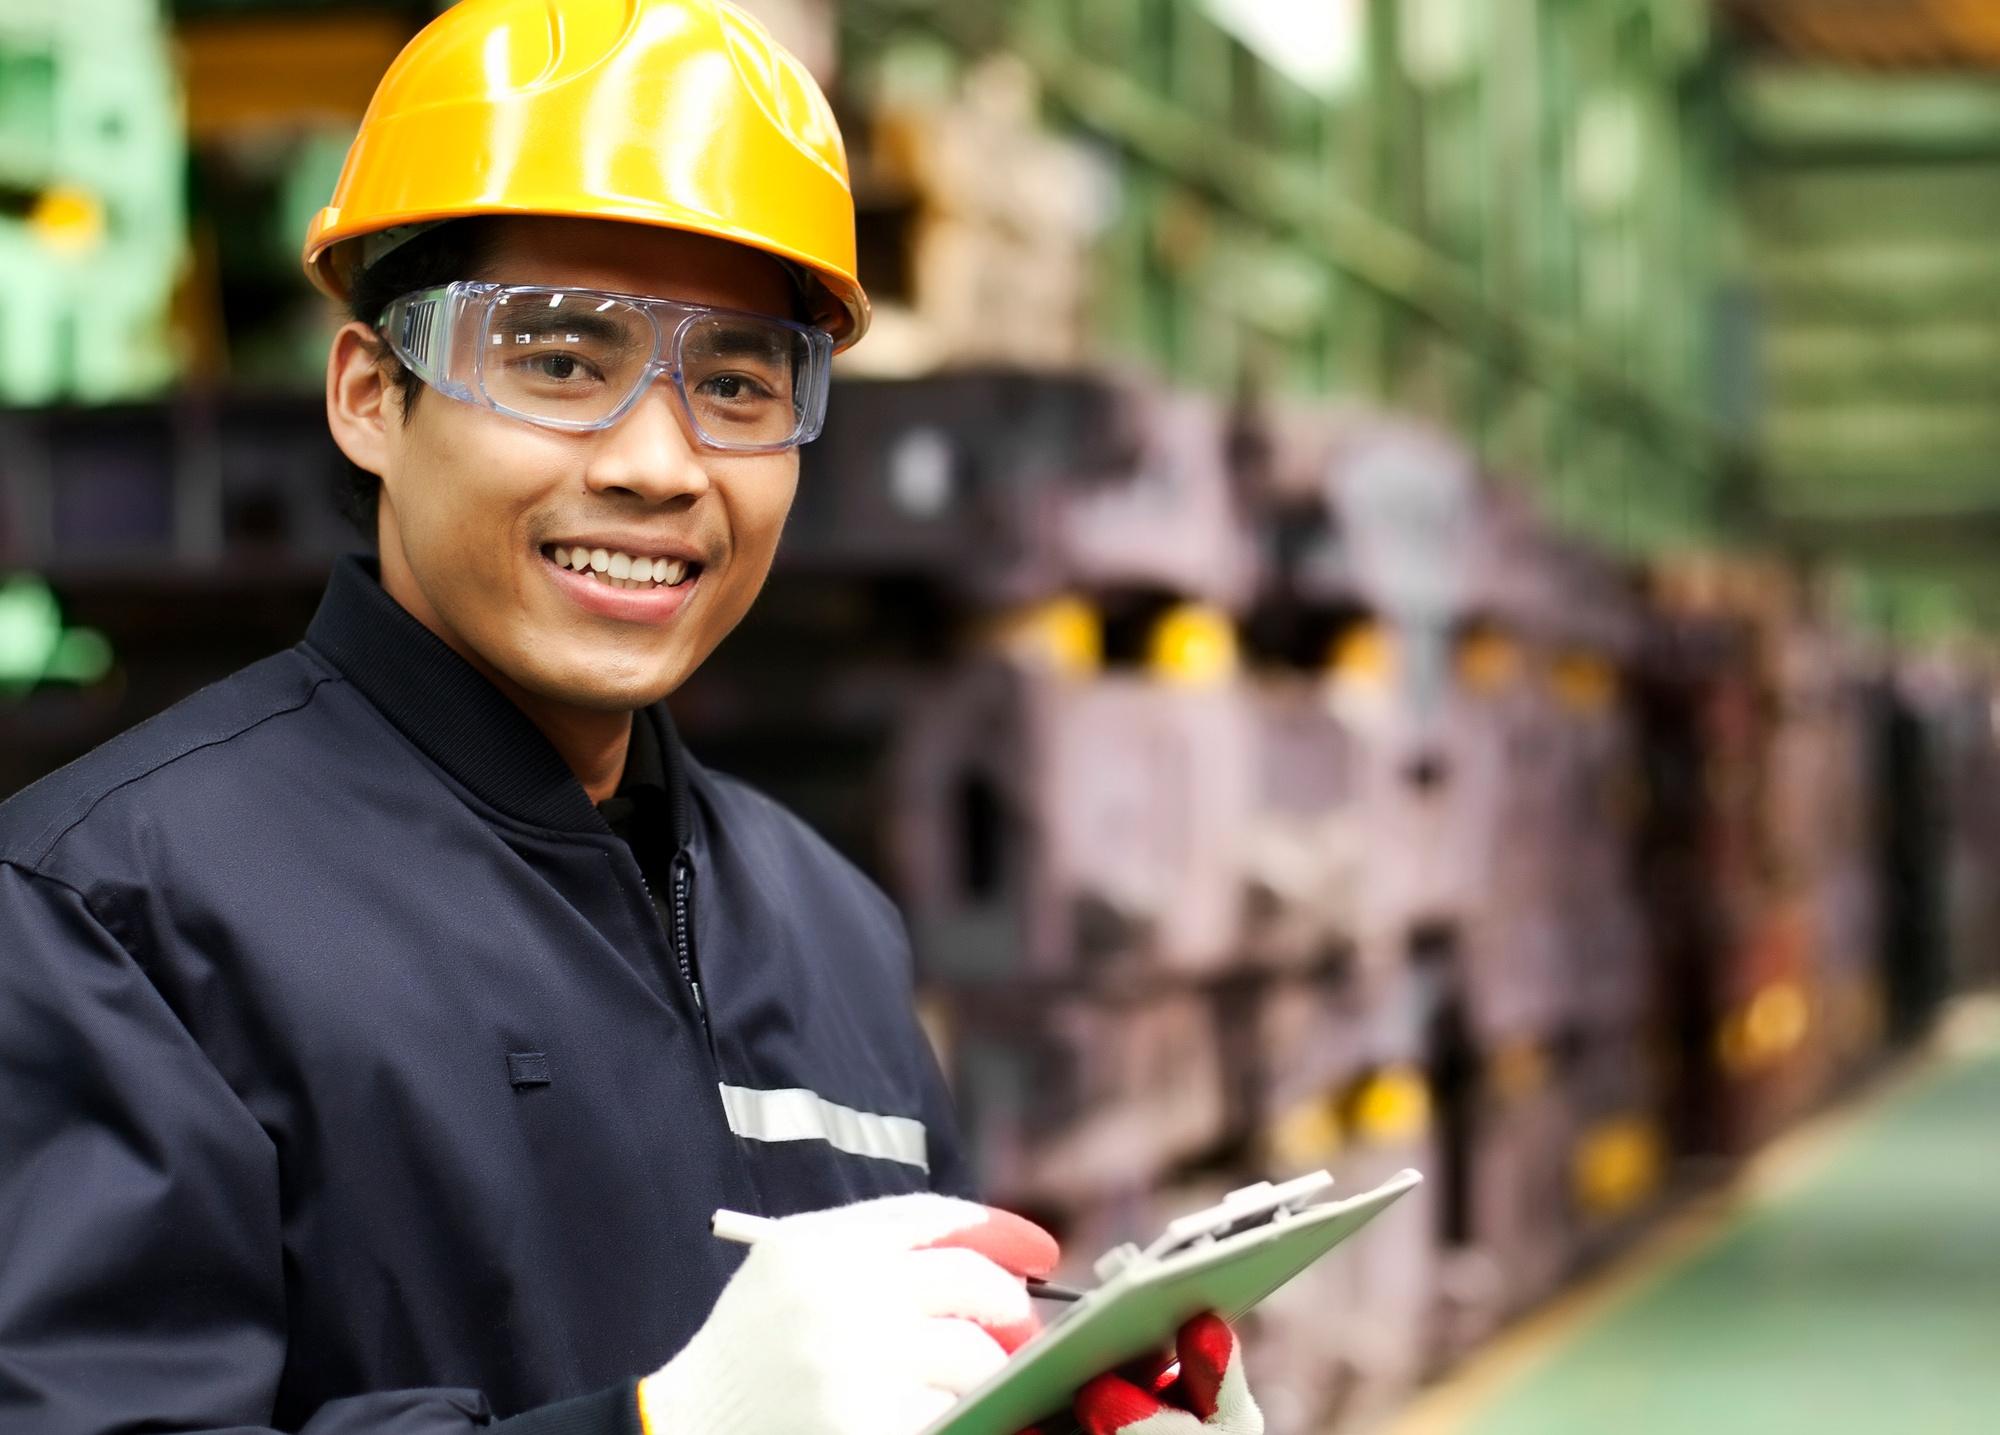 warehouse business management software